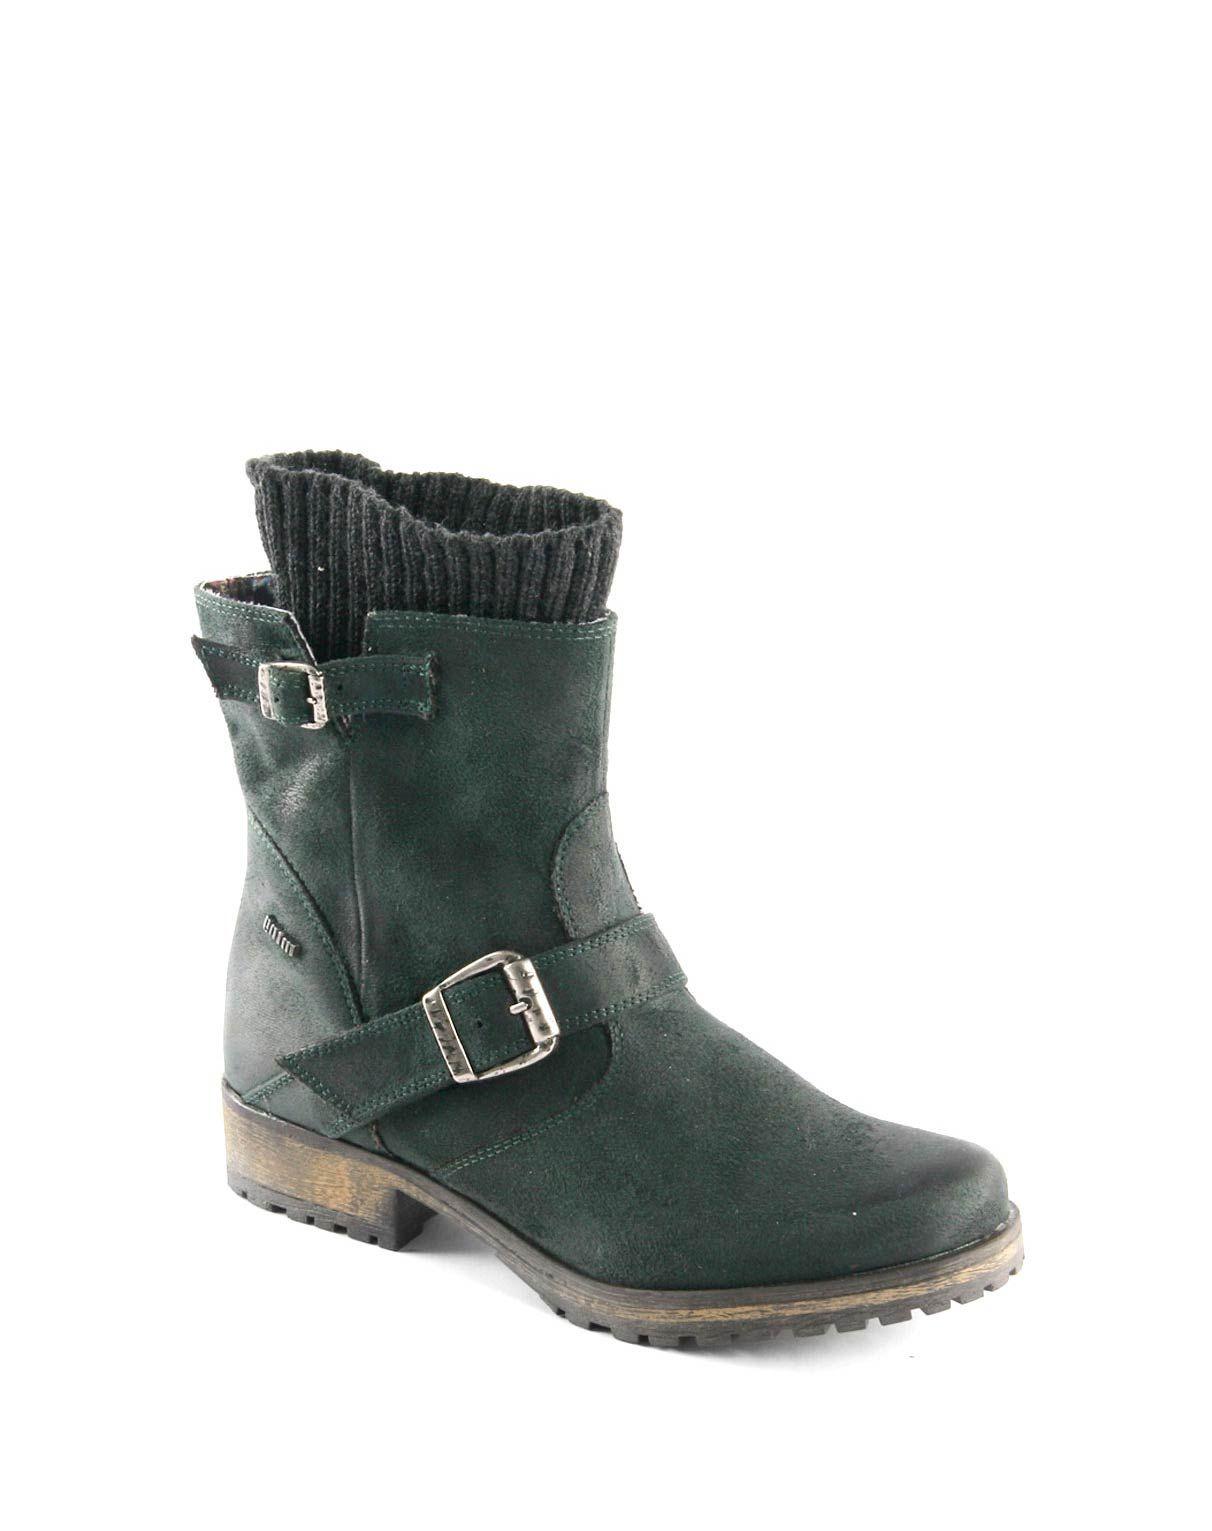 e356e73d 50722-bota-mujer-antelina-verde-mtng-mustang-01 | BOTAS CASUALES ...